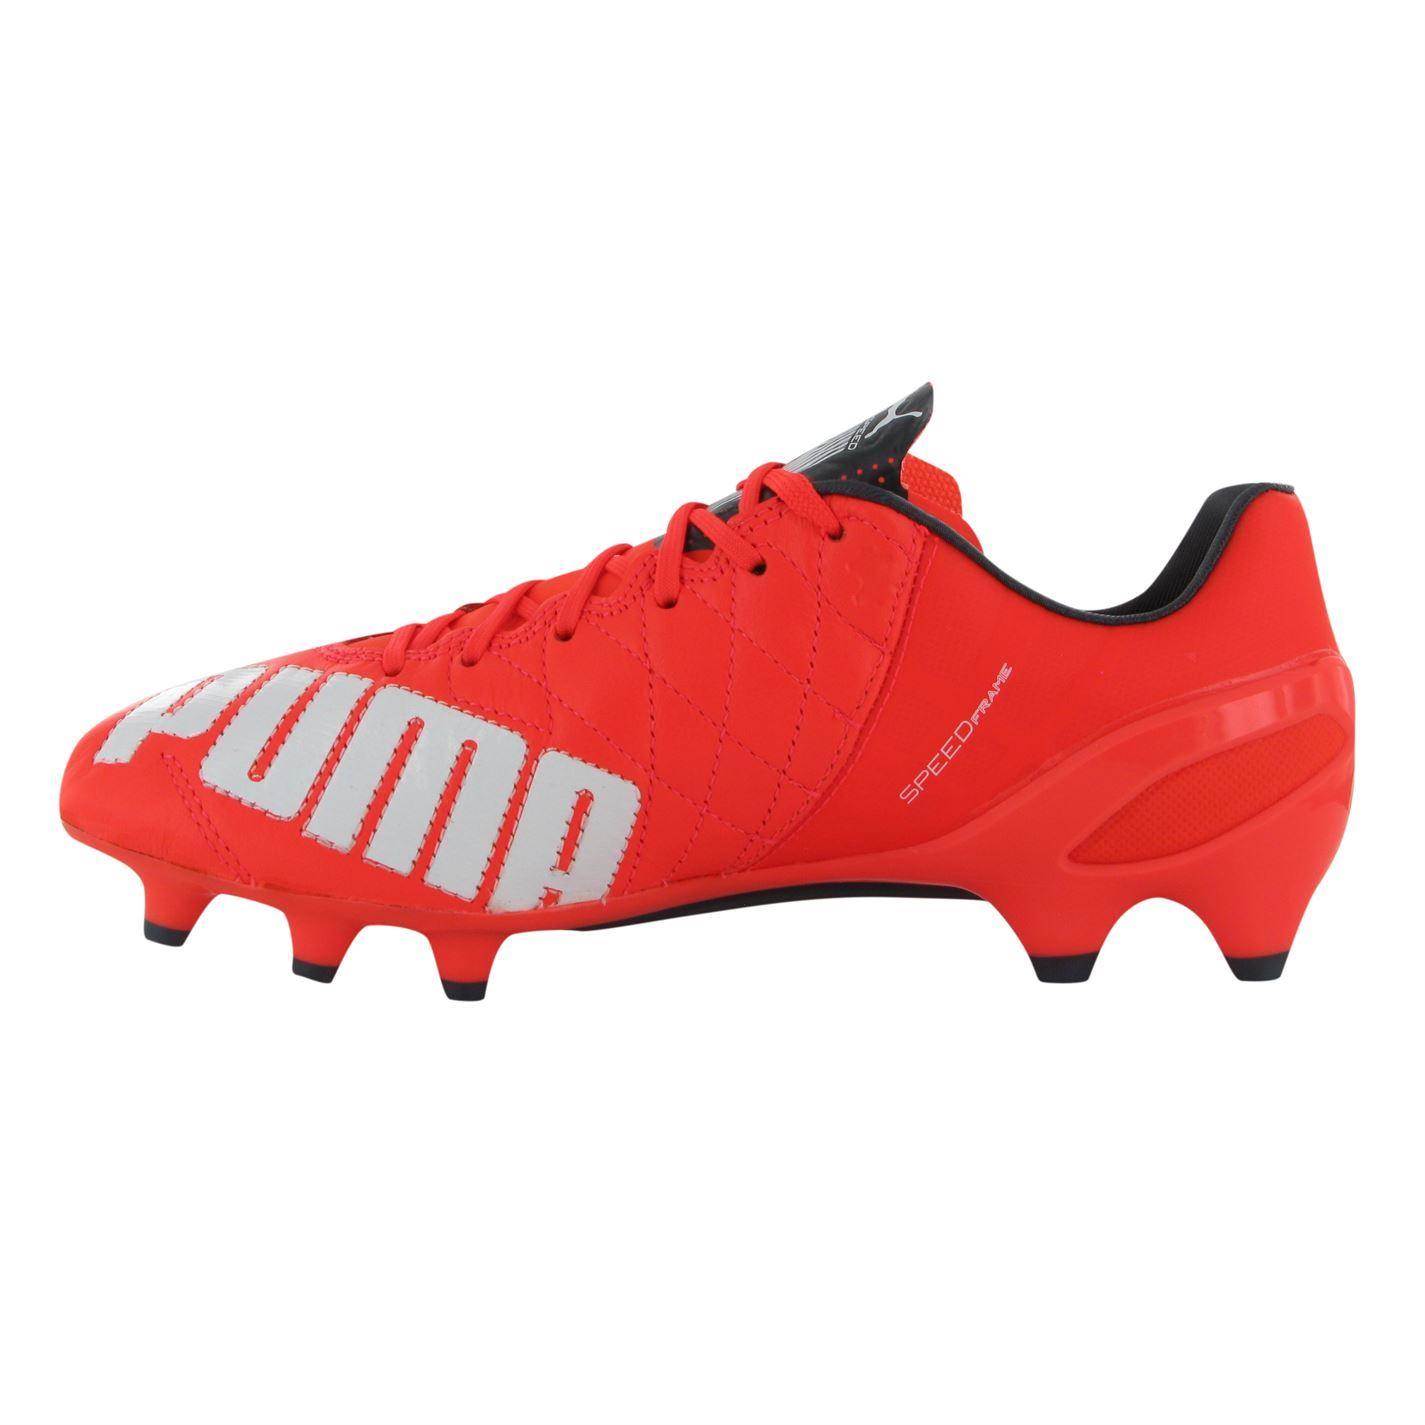 23b8c40f69a Puma evoSpeed 1 Leather FG Firm Ground Football Boots Mens Lava Soccer  Cleats